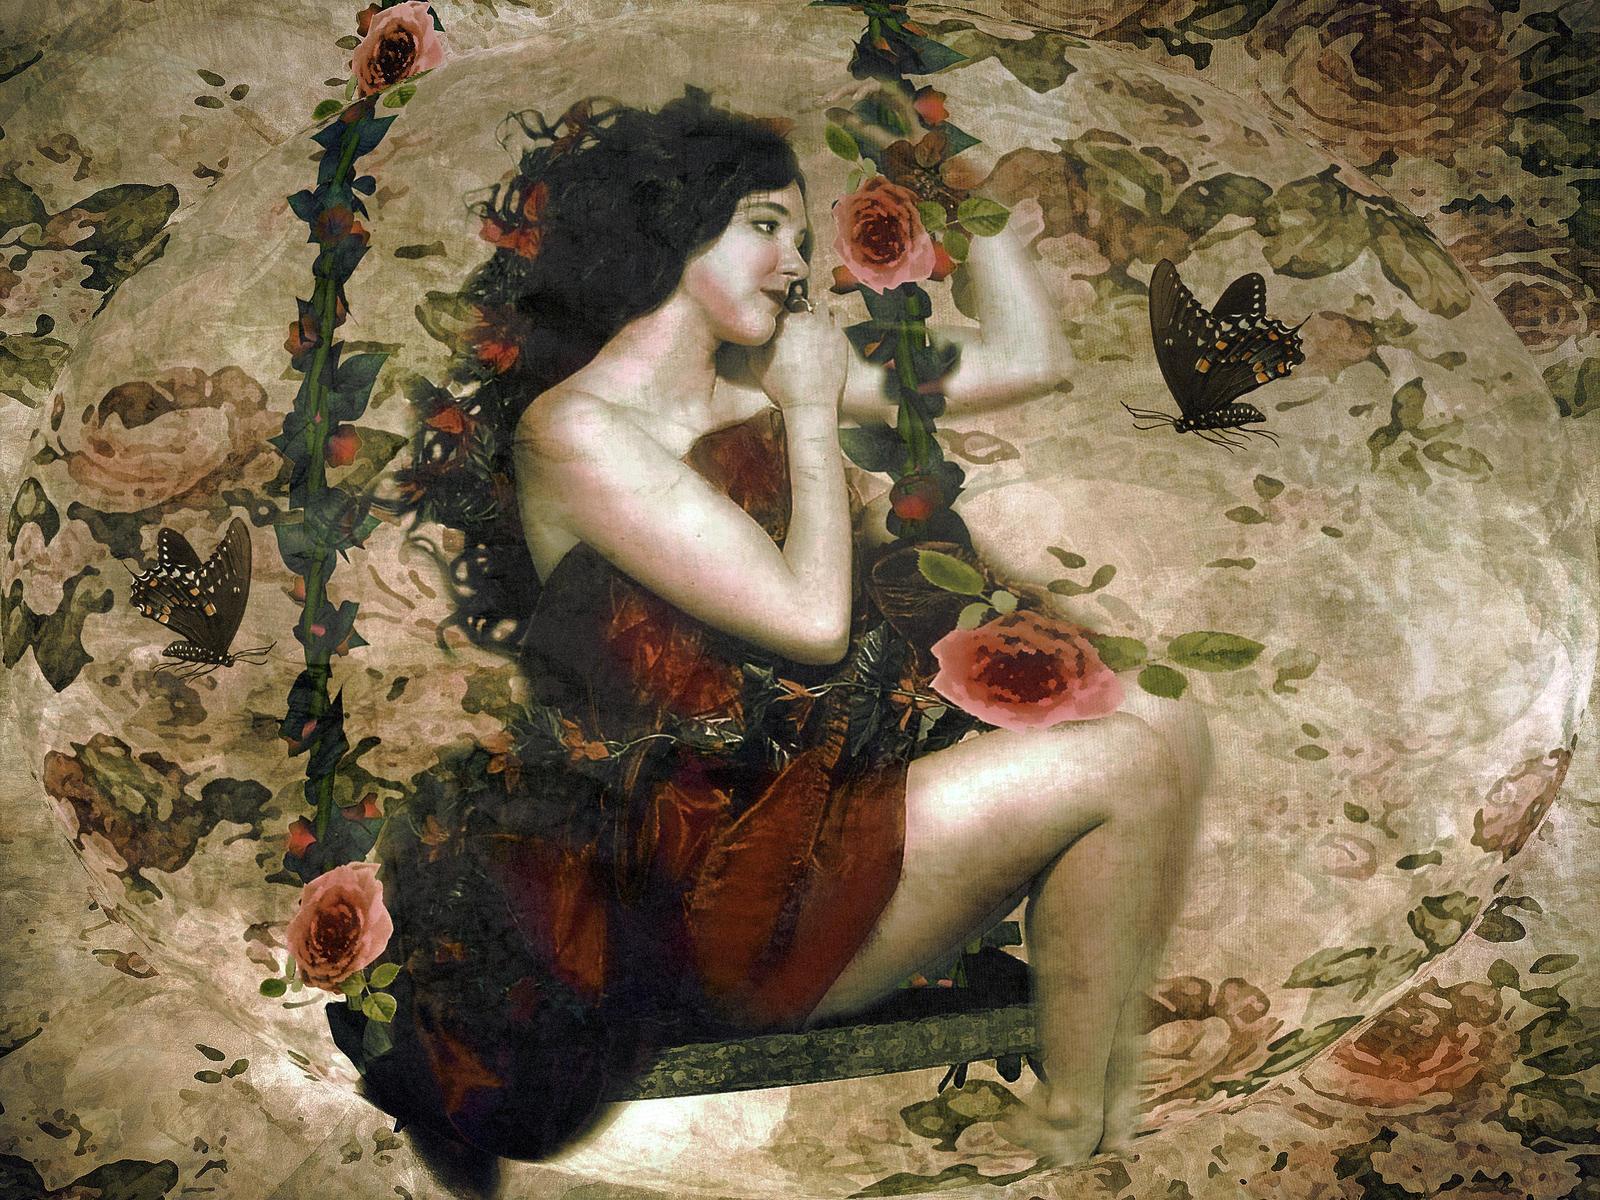 Floral Nymph 3 by LindArtz